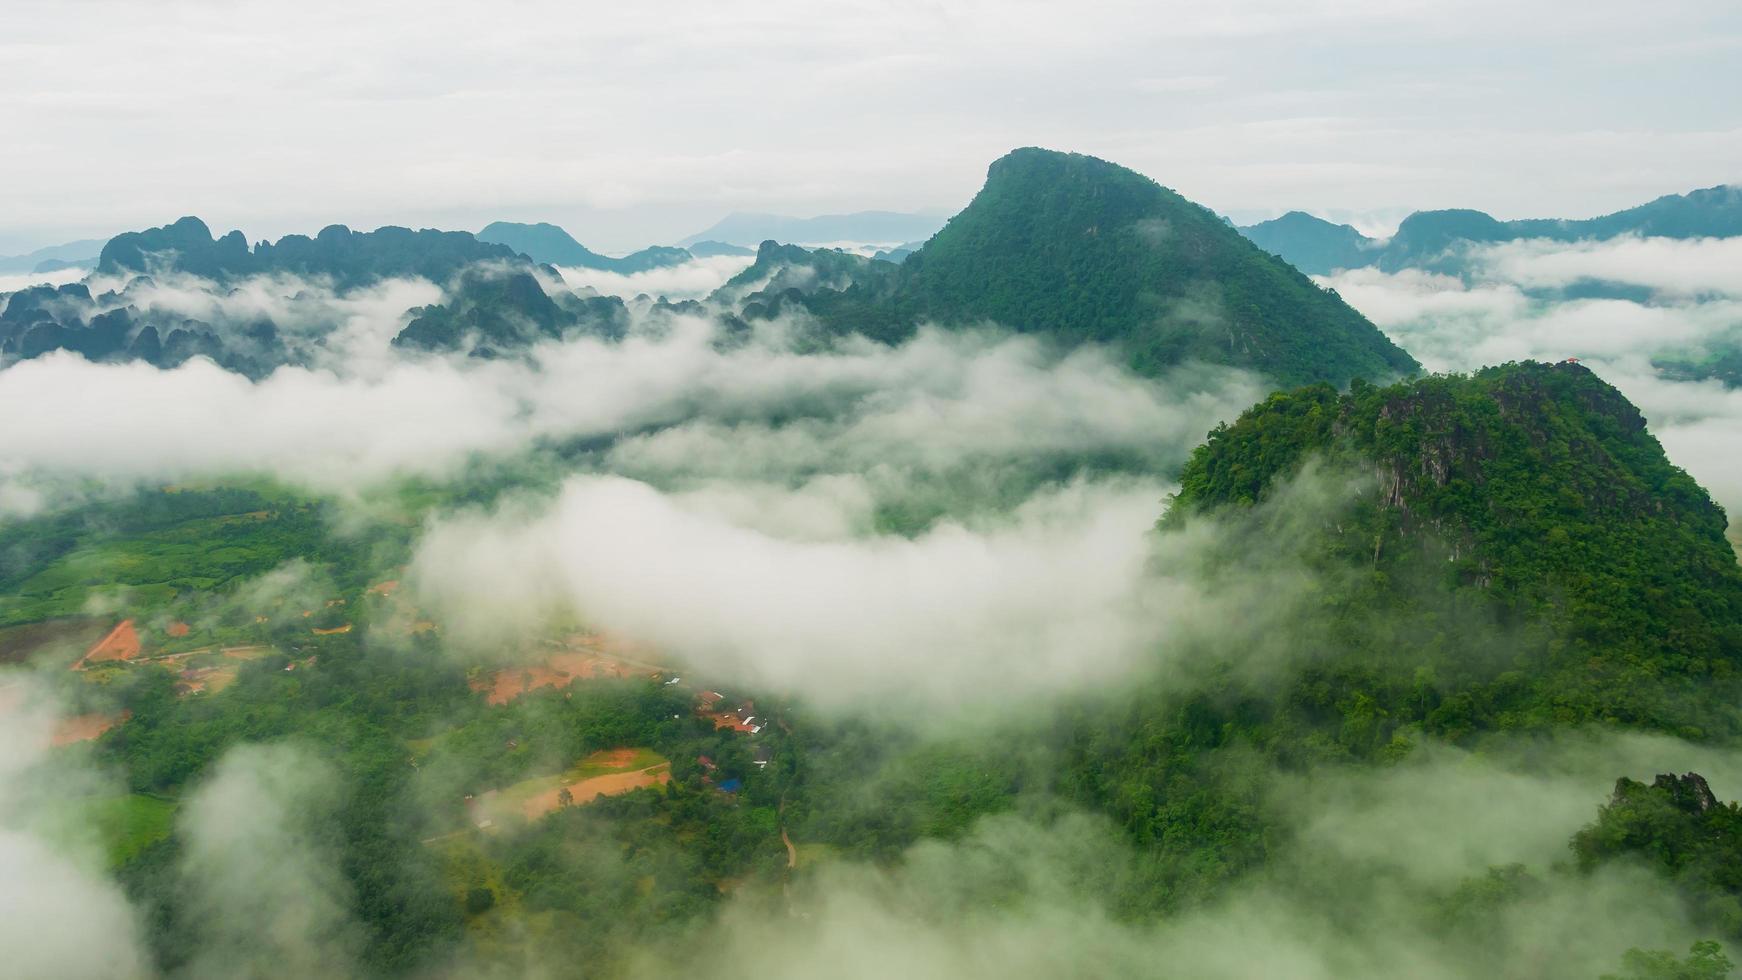 landschapsbergen en blauwe hemel met groene bomen in regenseizoen foto